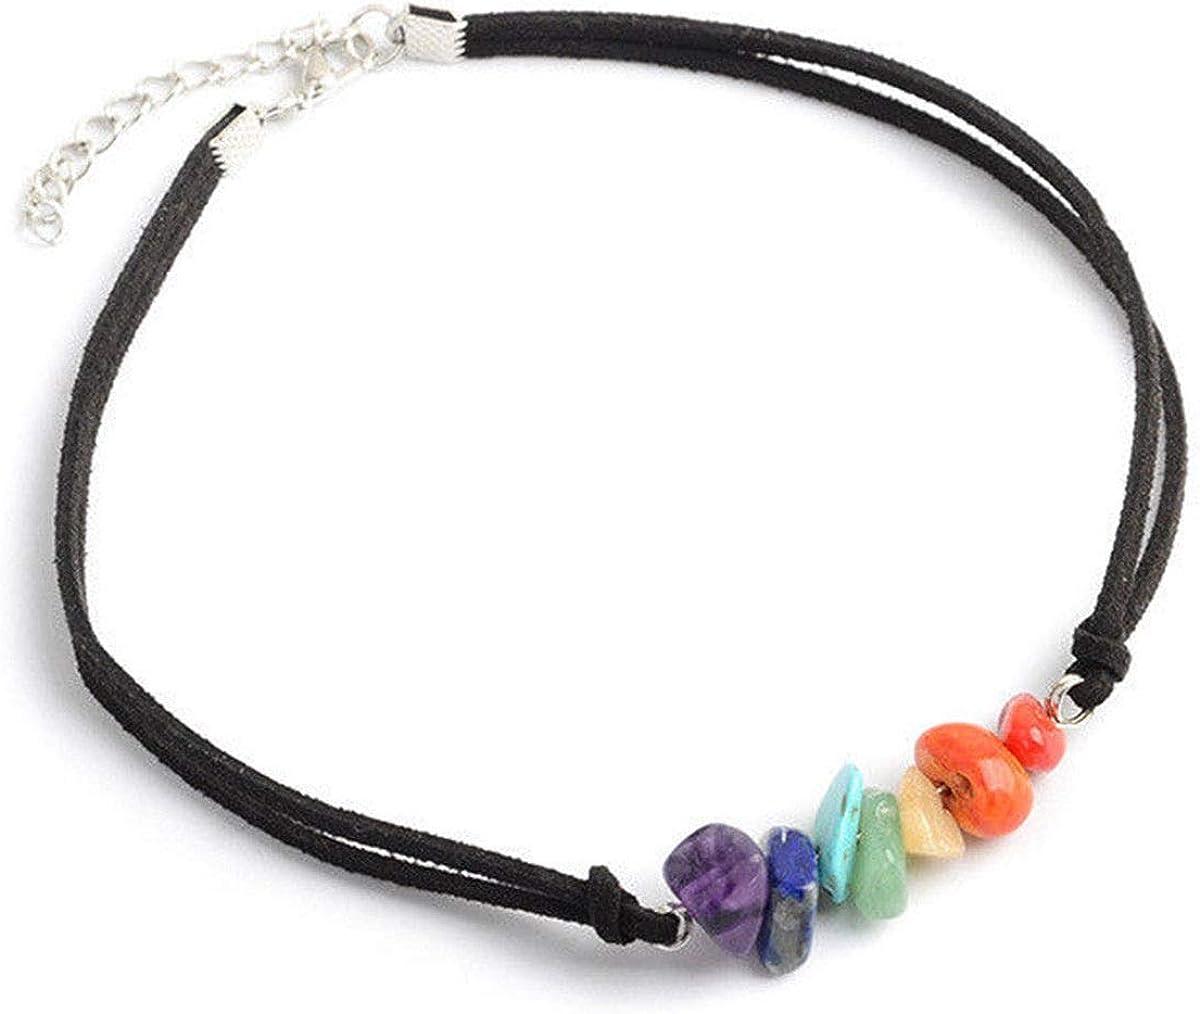 Today's Loot 7 Stone Chakra Black Choker Necklace